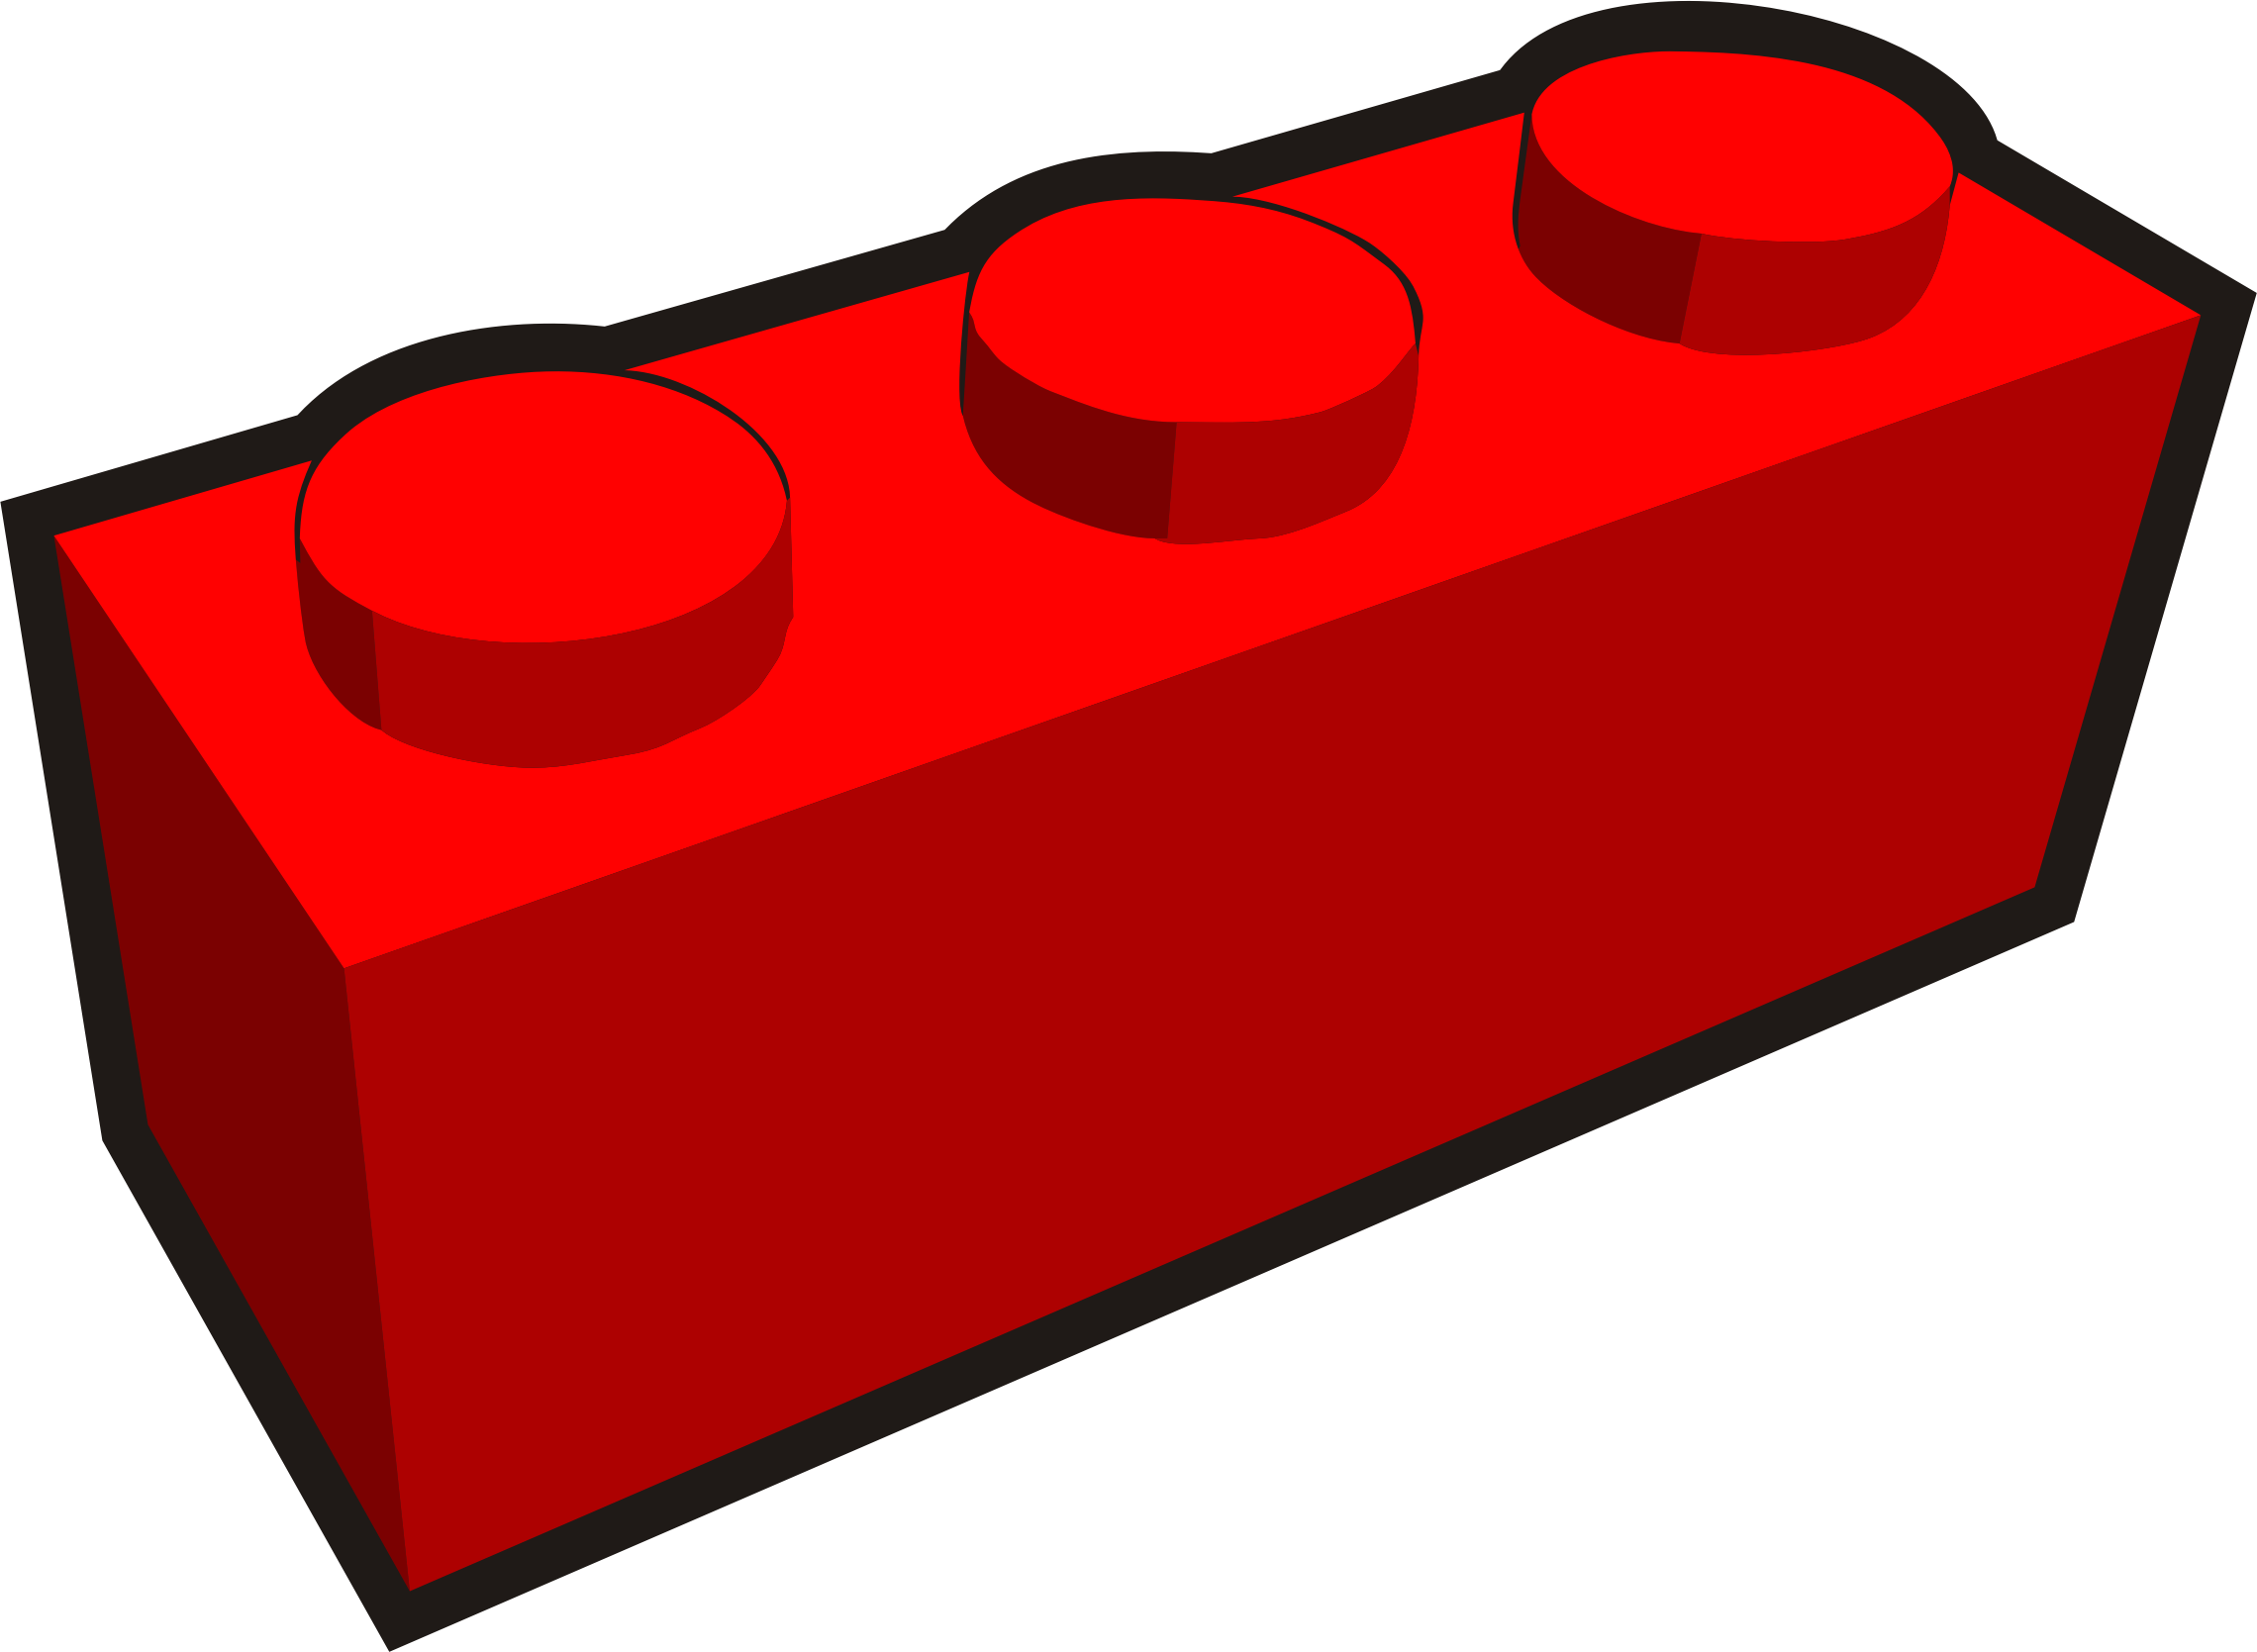 Lego Bricks Clipart.